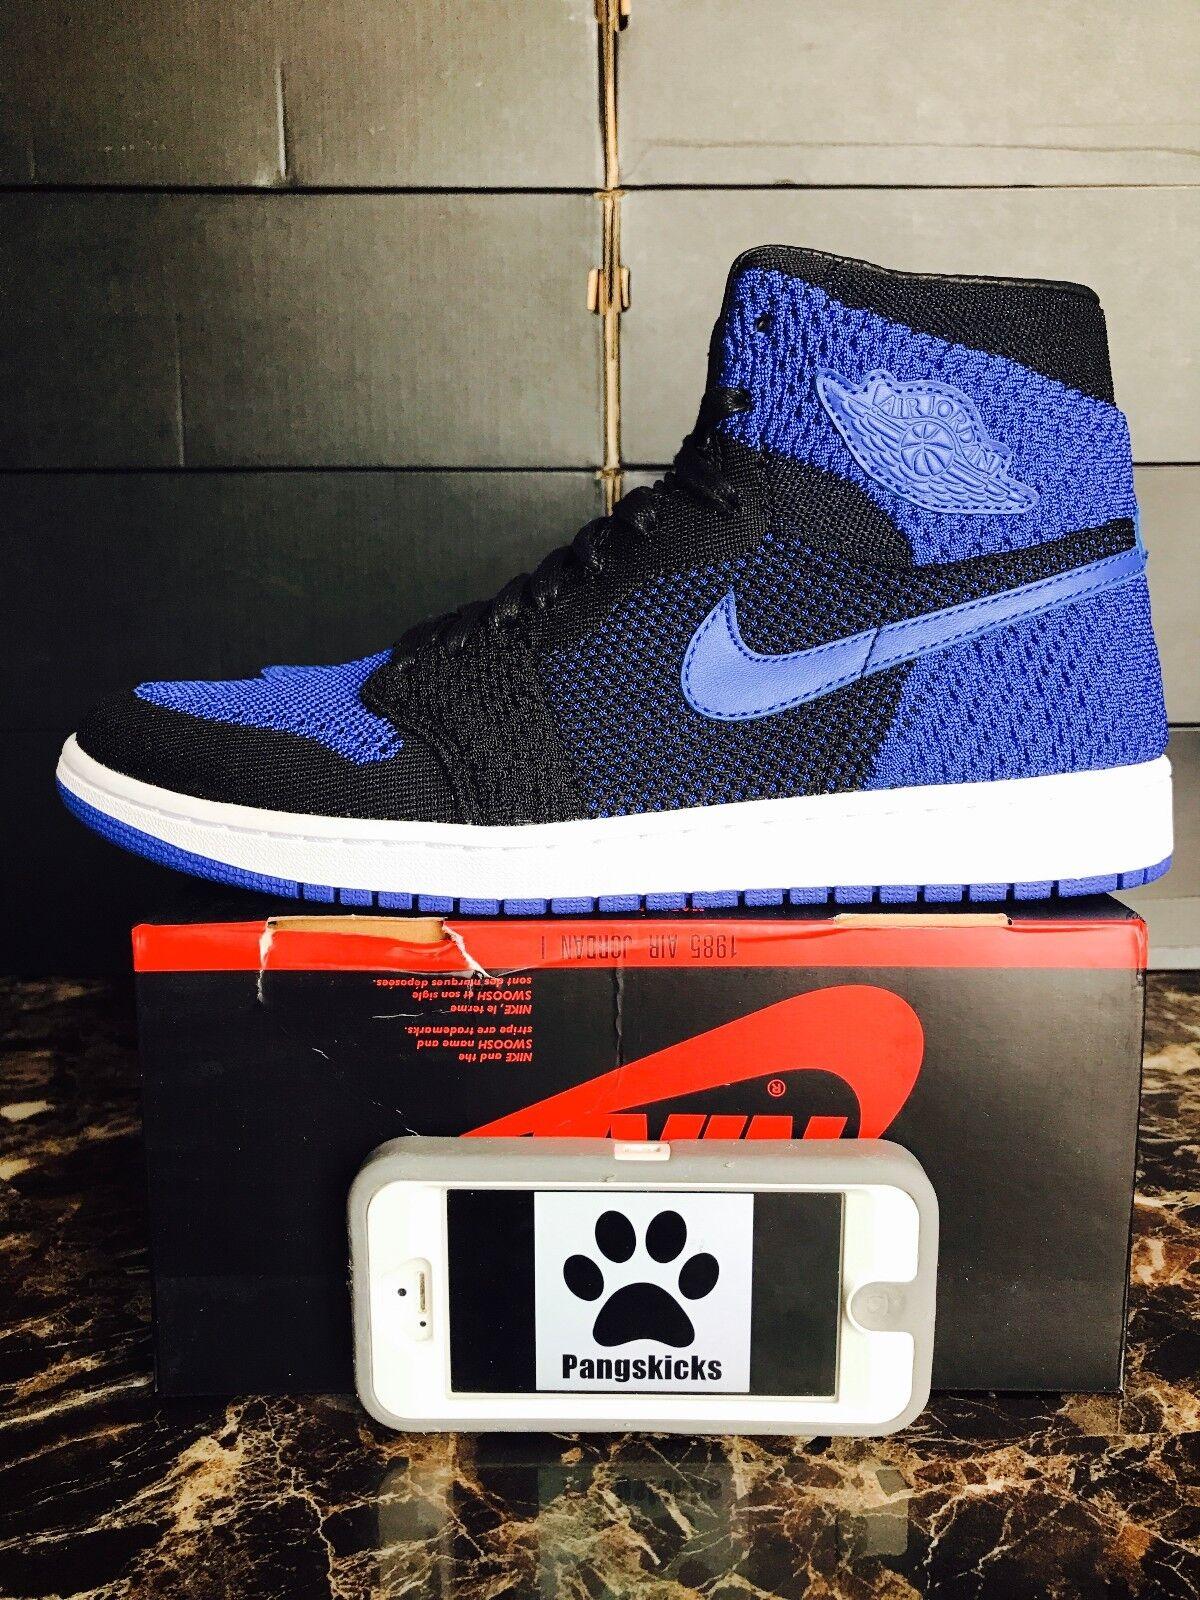 Nike Air Jordan 1 Retro High Flyknit Royal Blue Black 919704-006 Comfortable Cheap and beautiful fashion